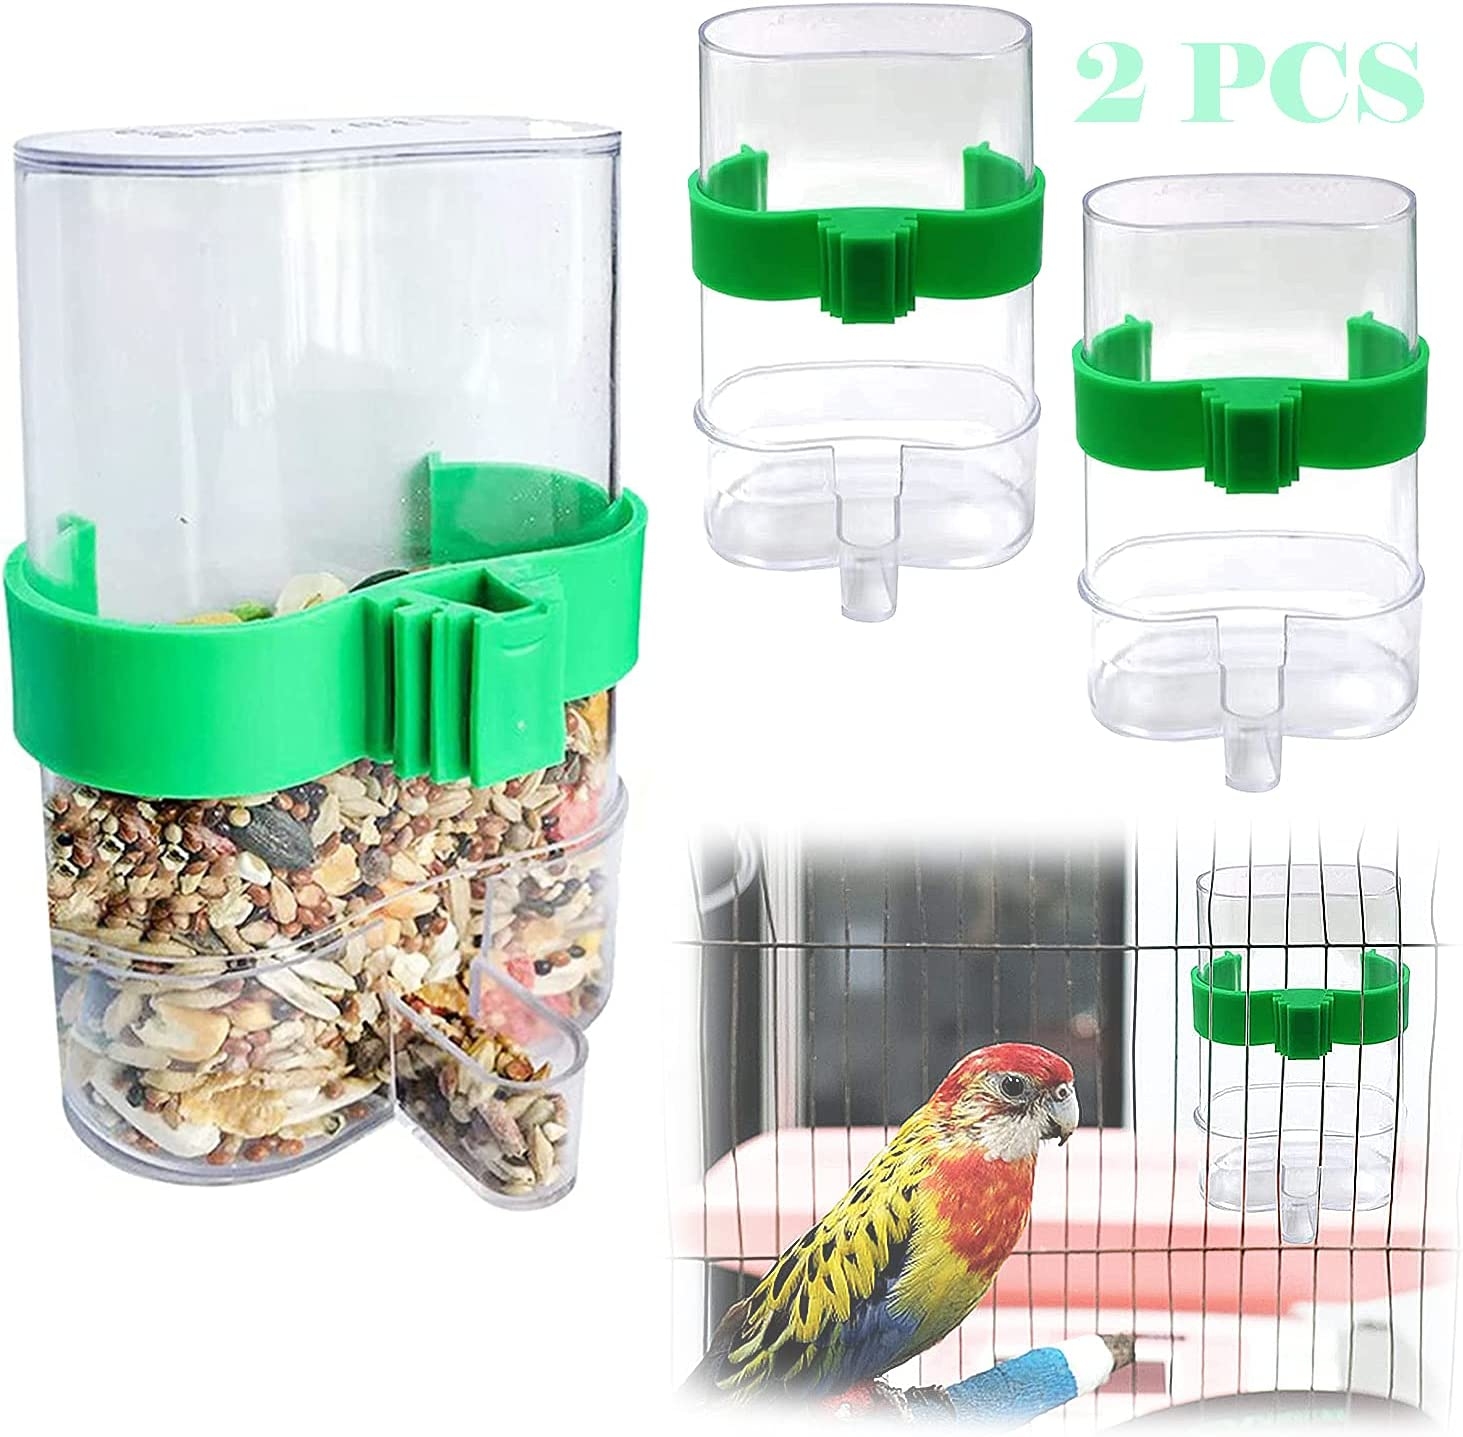 2 Pcs Automatic Bird Waterer Food Feeder, Parakeet Food Bird Water Bottle Dispenser for Cage Cover Bird Waterer Bird Parakeet Cage Accessories, Bird Food Bowl Feed Water Dispenser (2 Pcs)